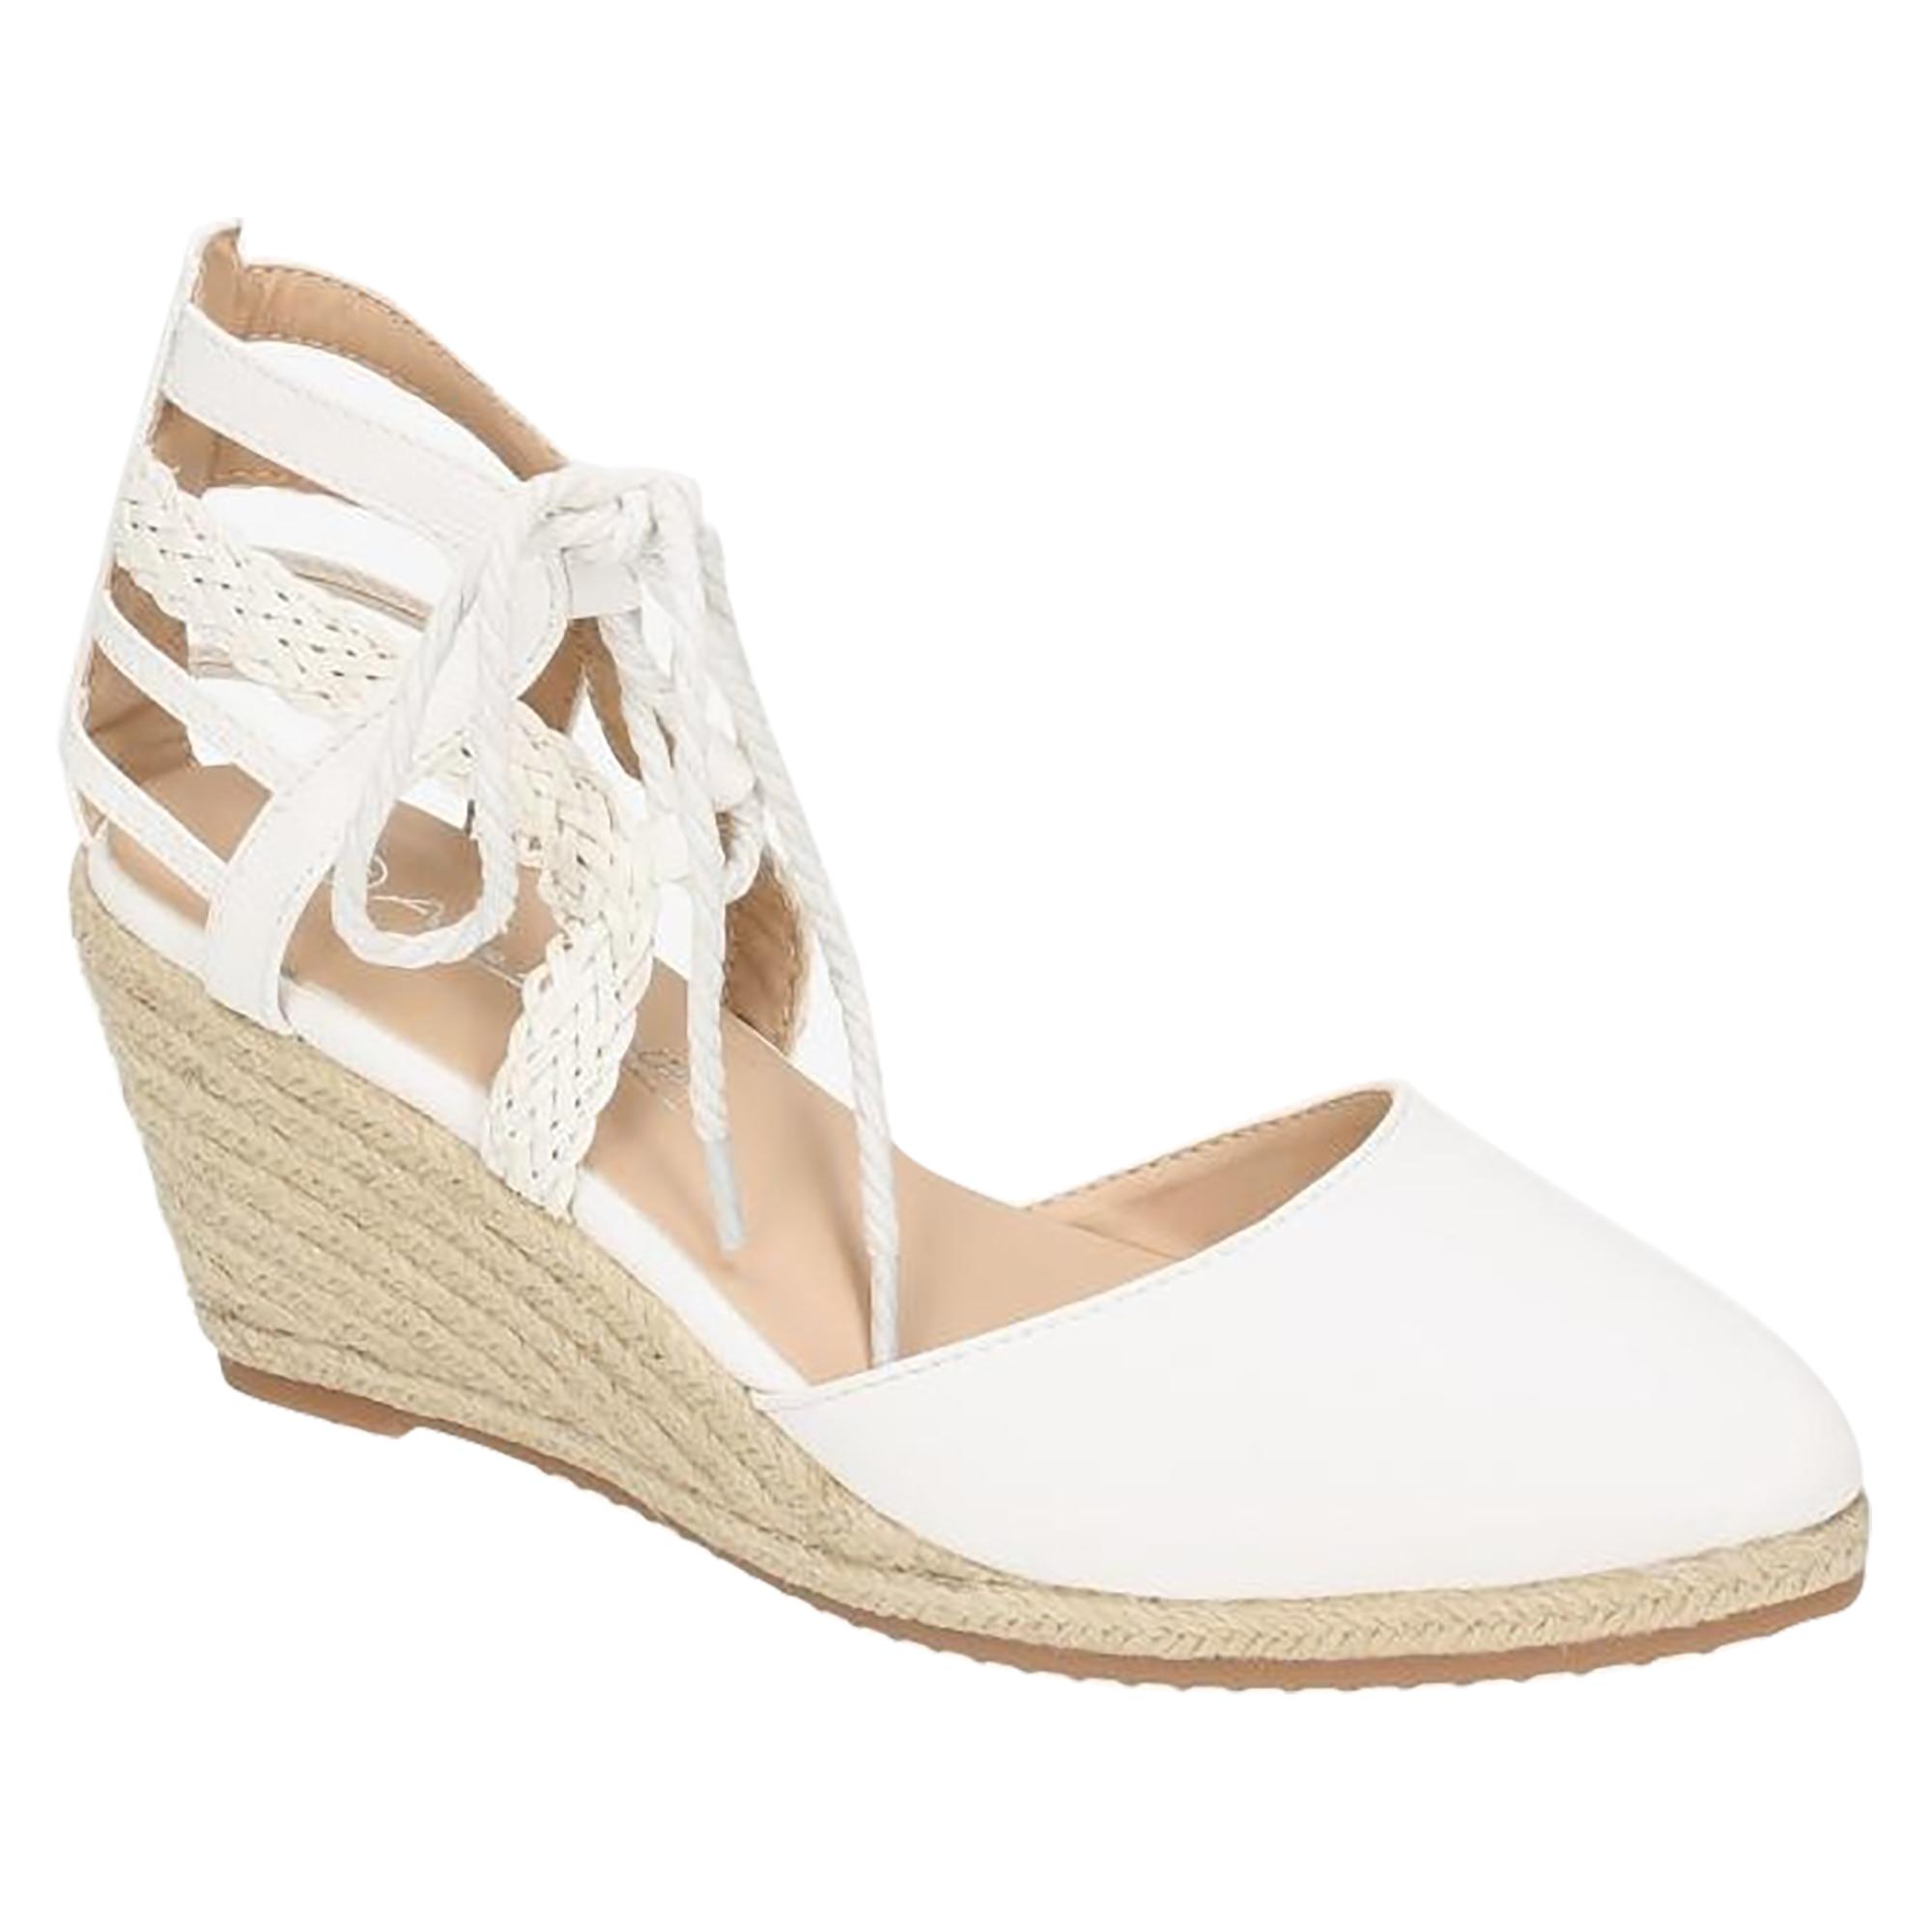 New Clothing Shoes Accessories Gt Women39s Shoes Gt Sandals FlipFlops